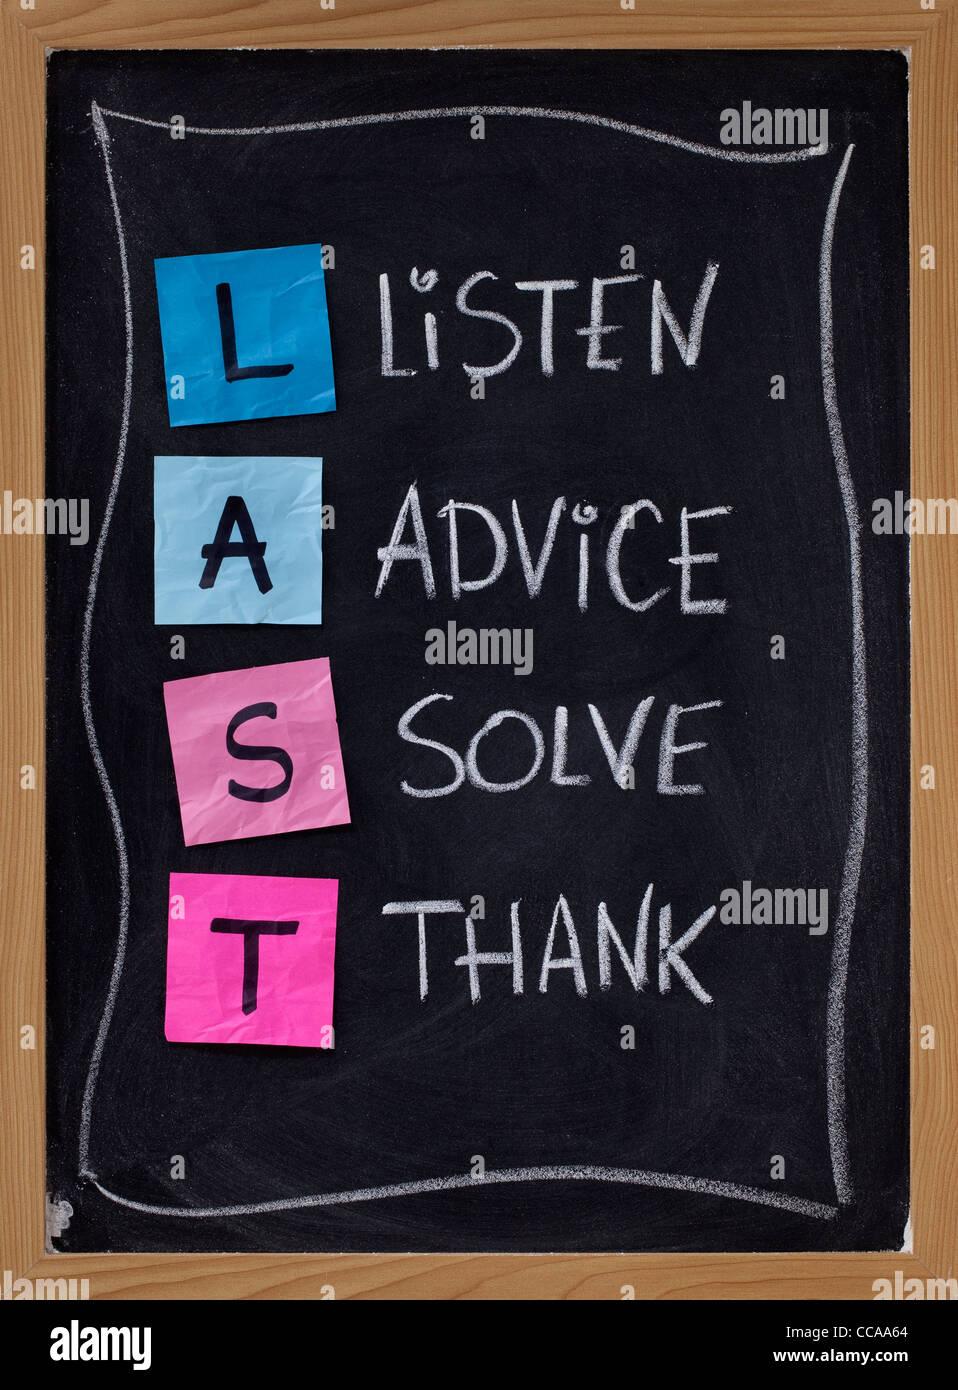 LAST (listen, advice, solve, thank) - acronym for training customer service and complaints handling. blackboard - Stock Image